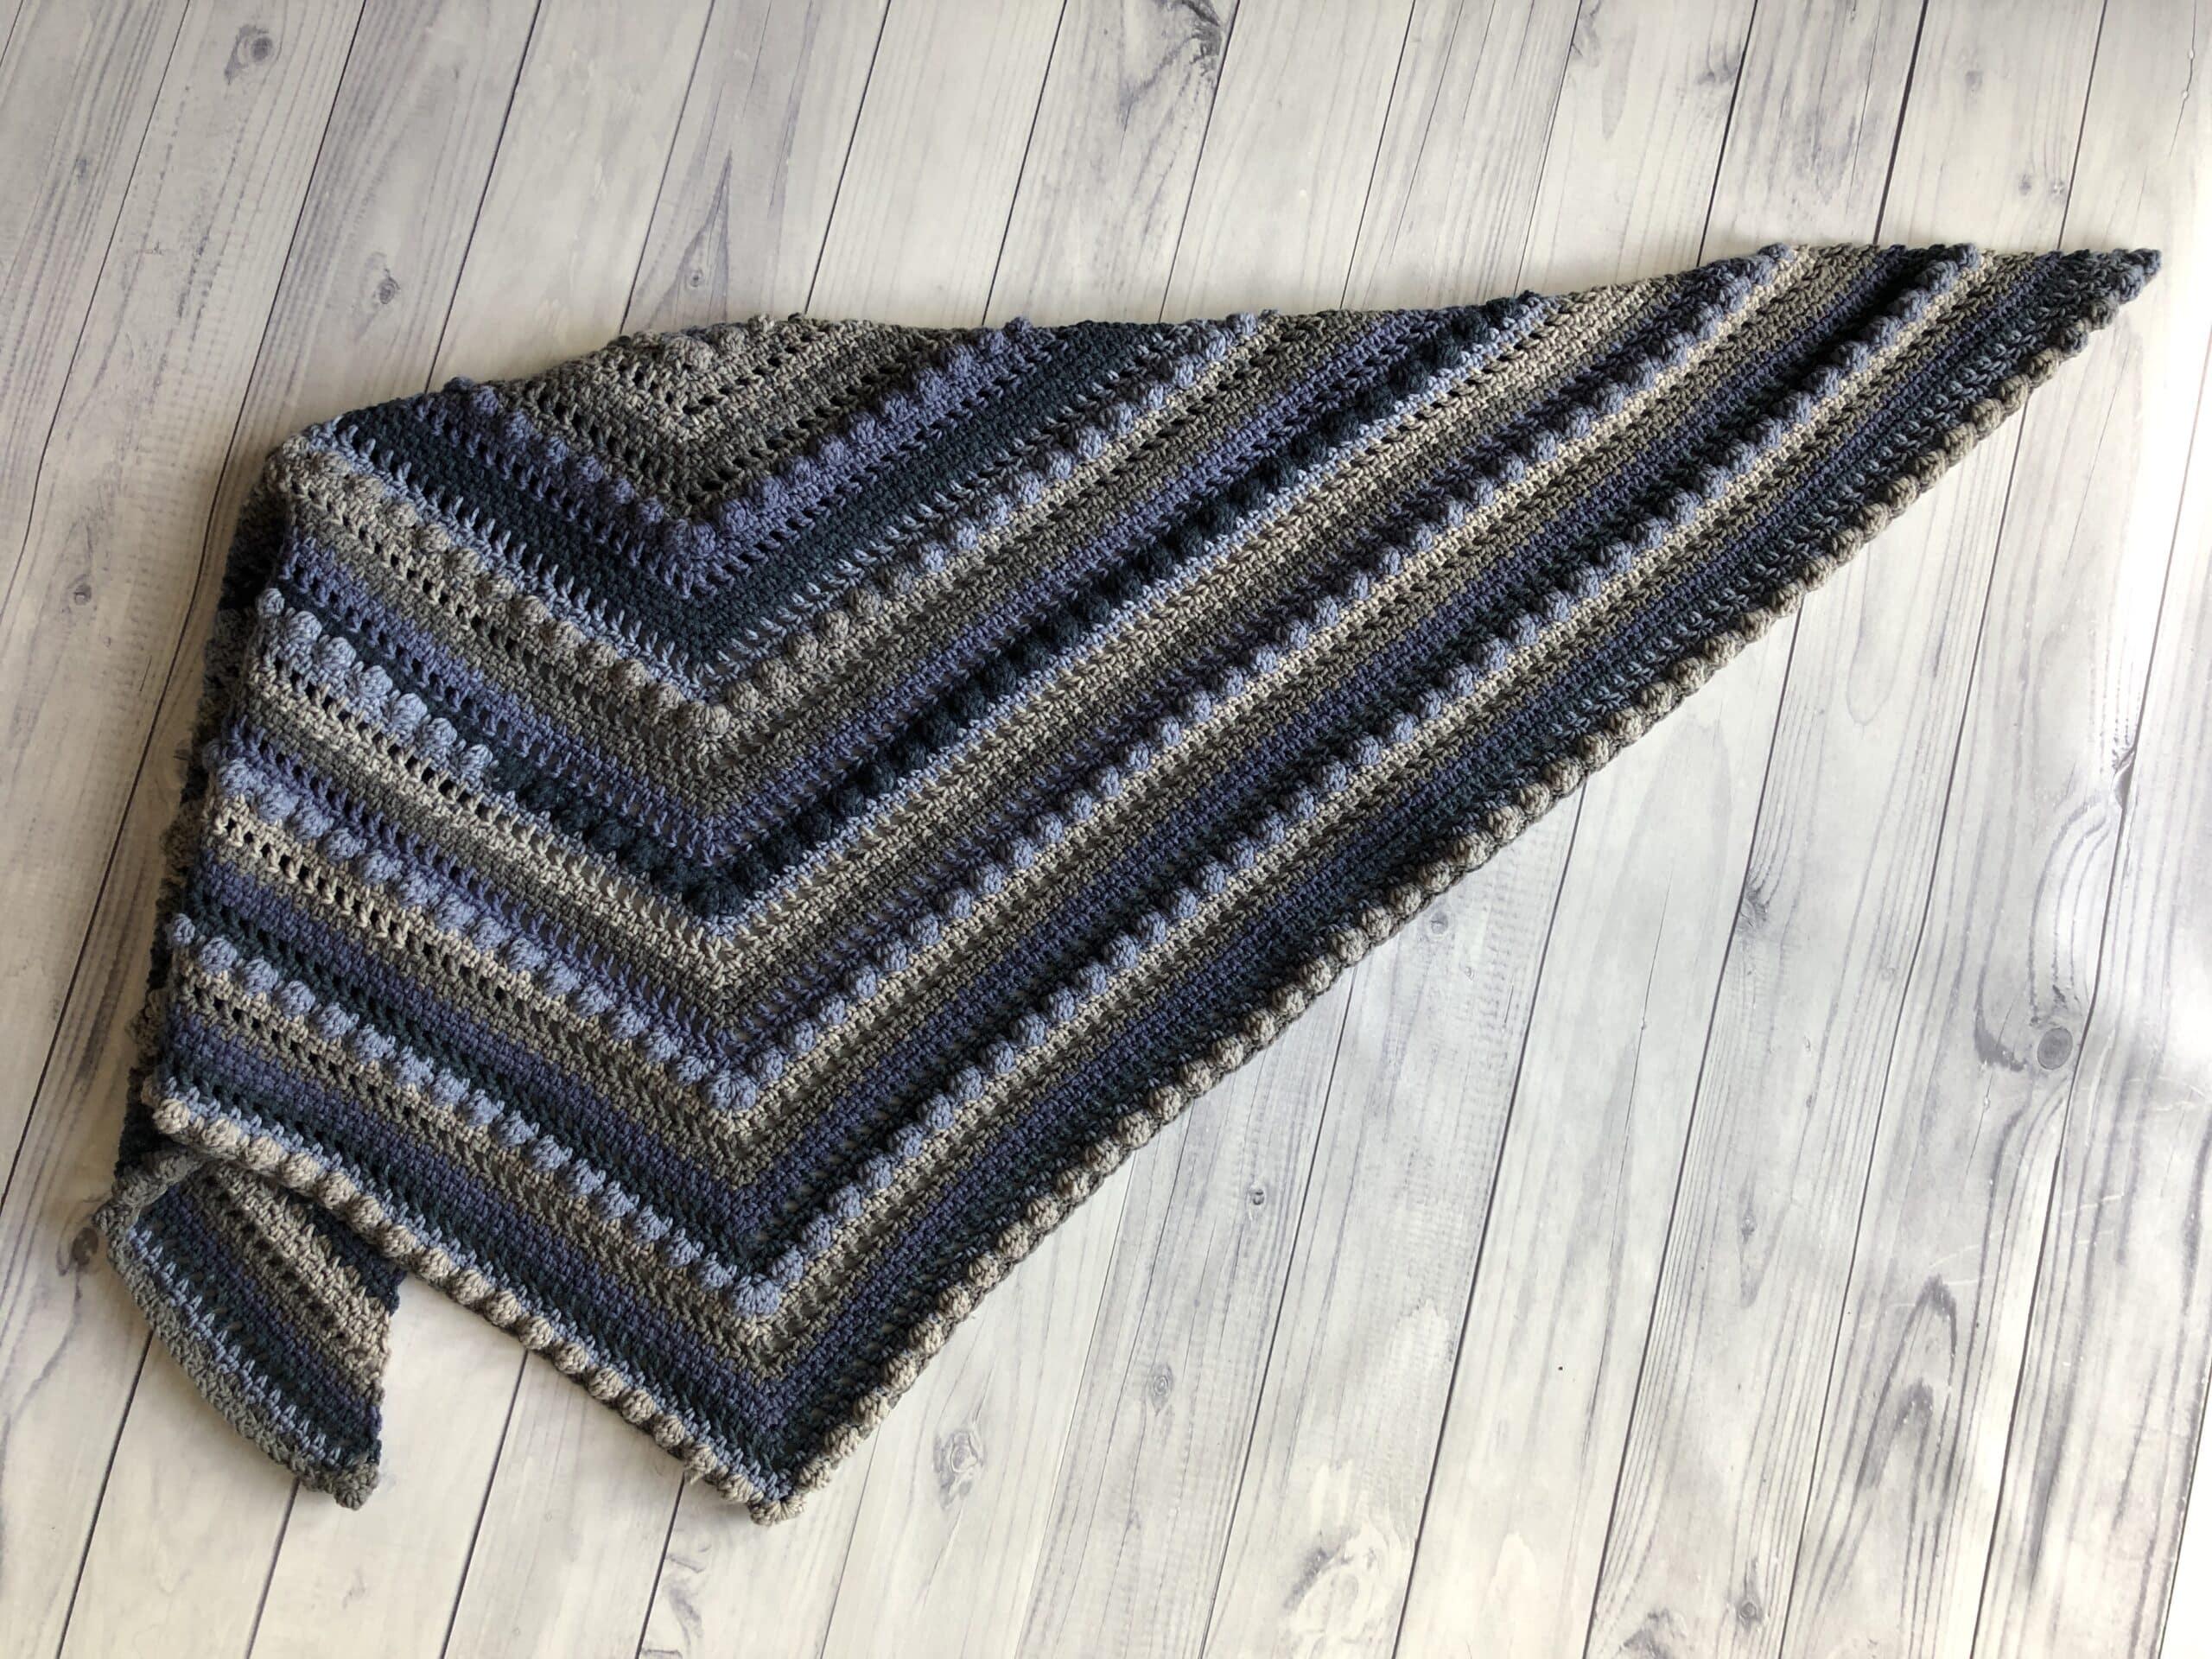 Crochet Triangle Shawl5